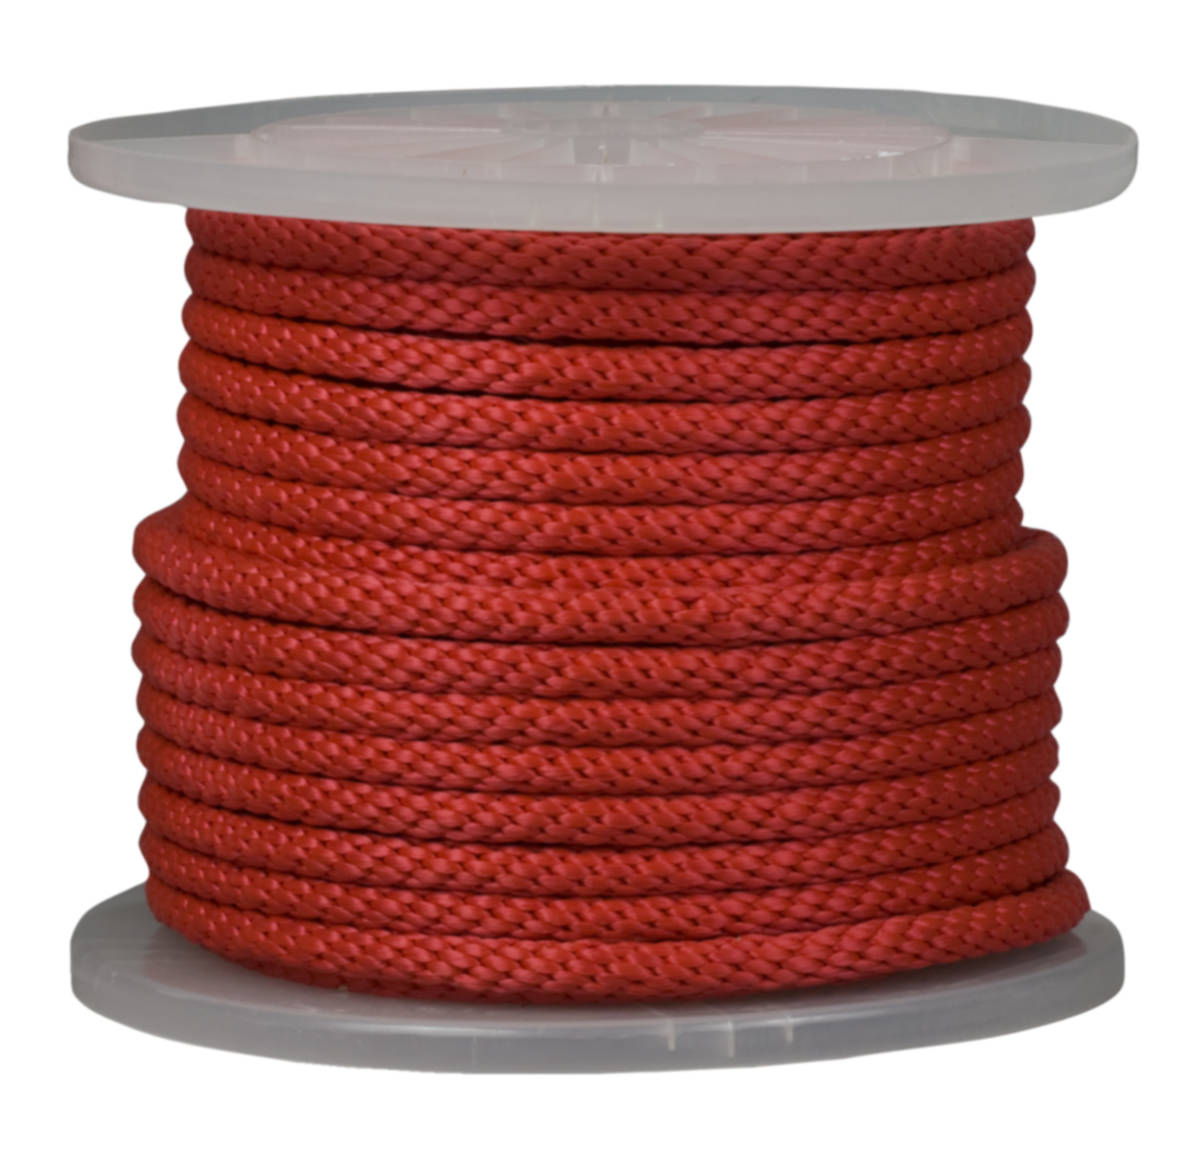 Ben-Mor Cables 60269